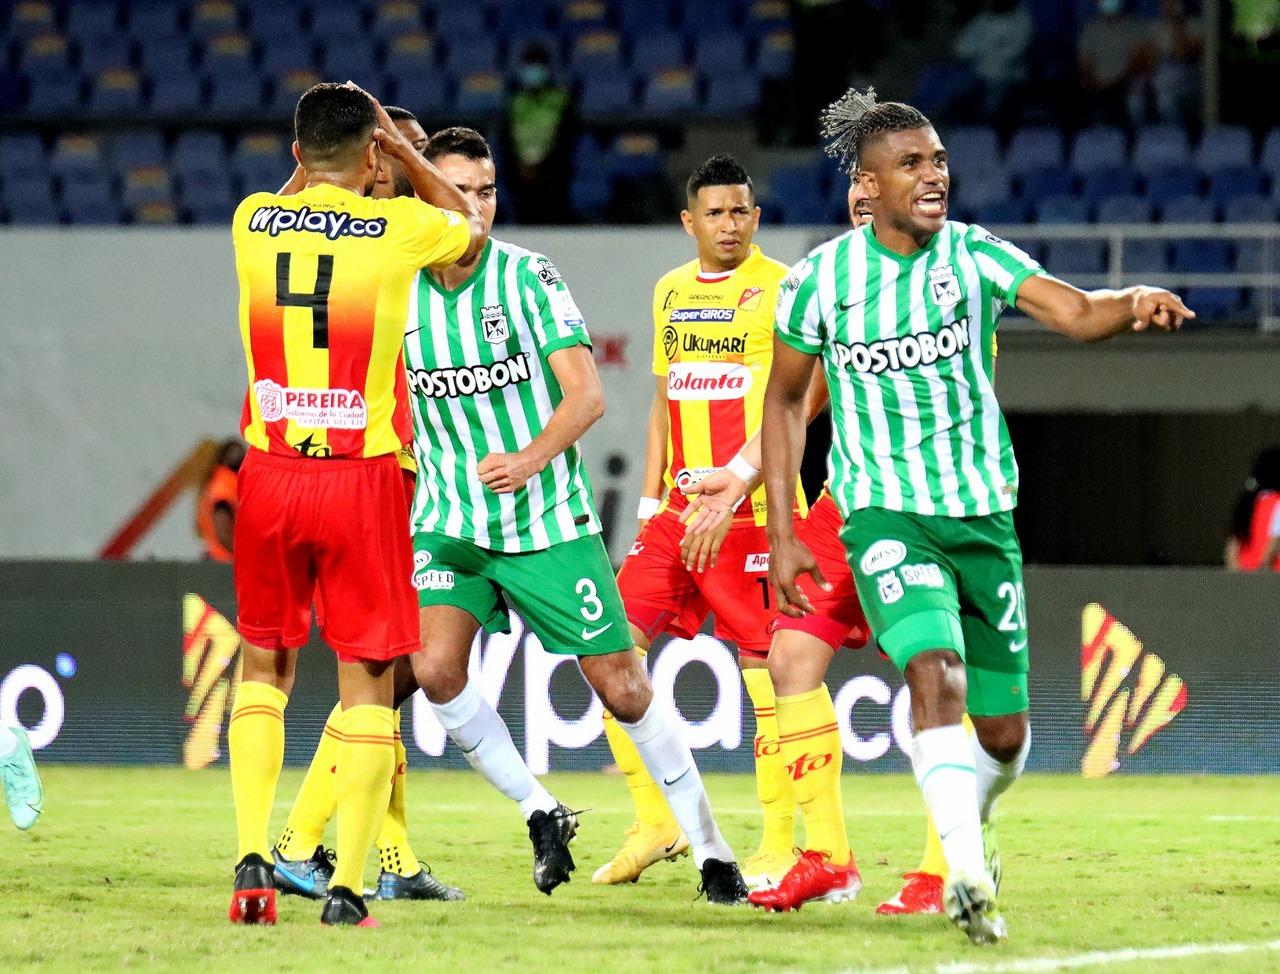 Pereira vs Nacional 6